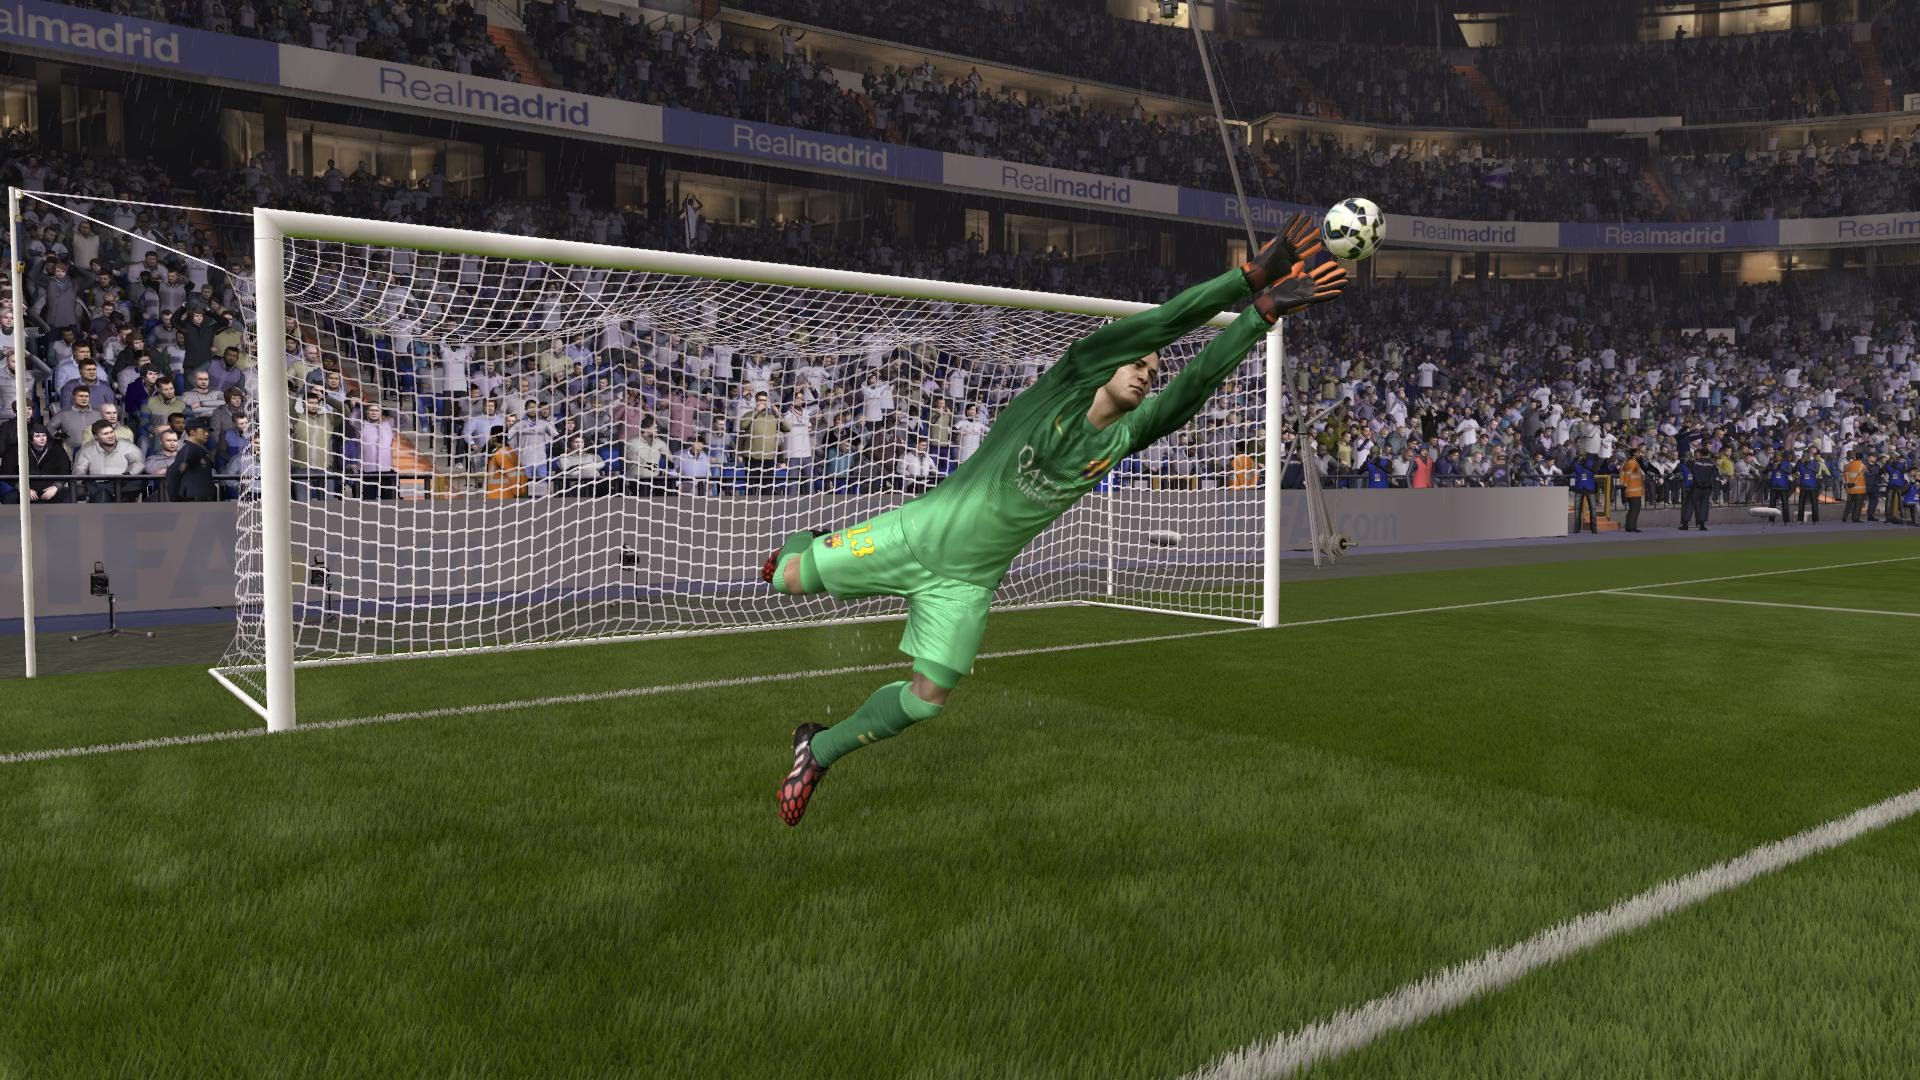 Goalkeeper saves photo